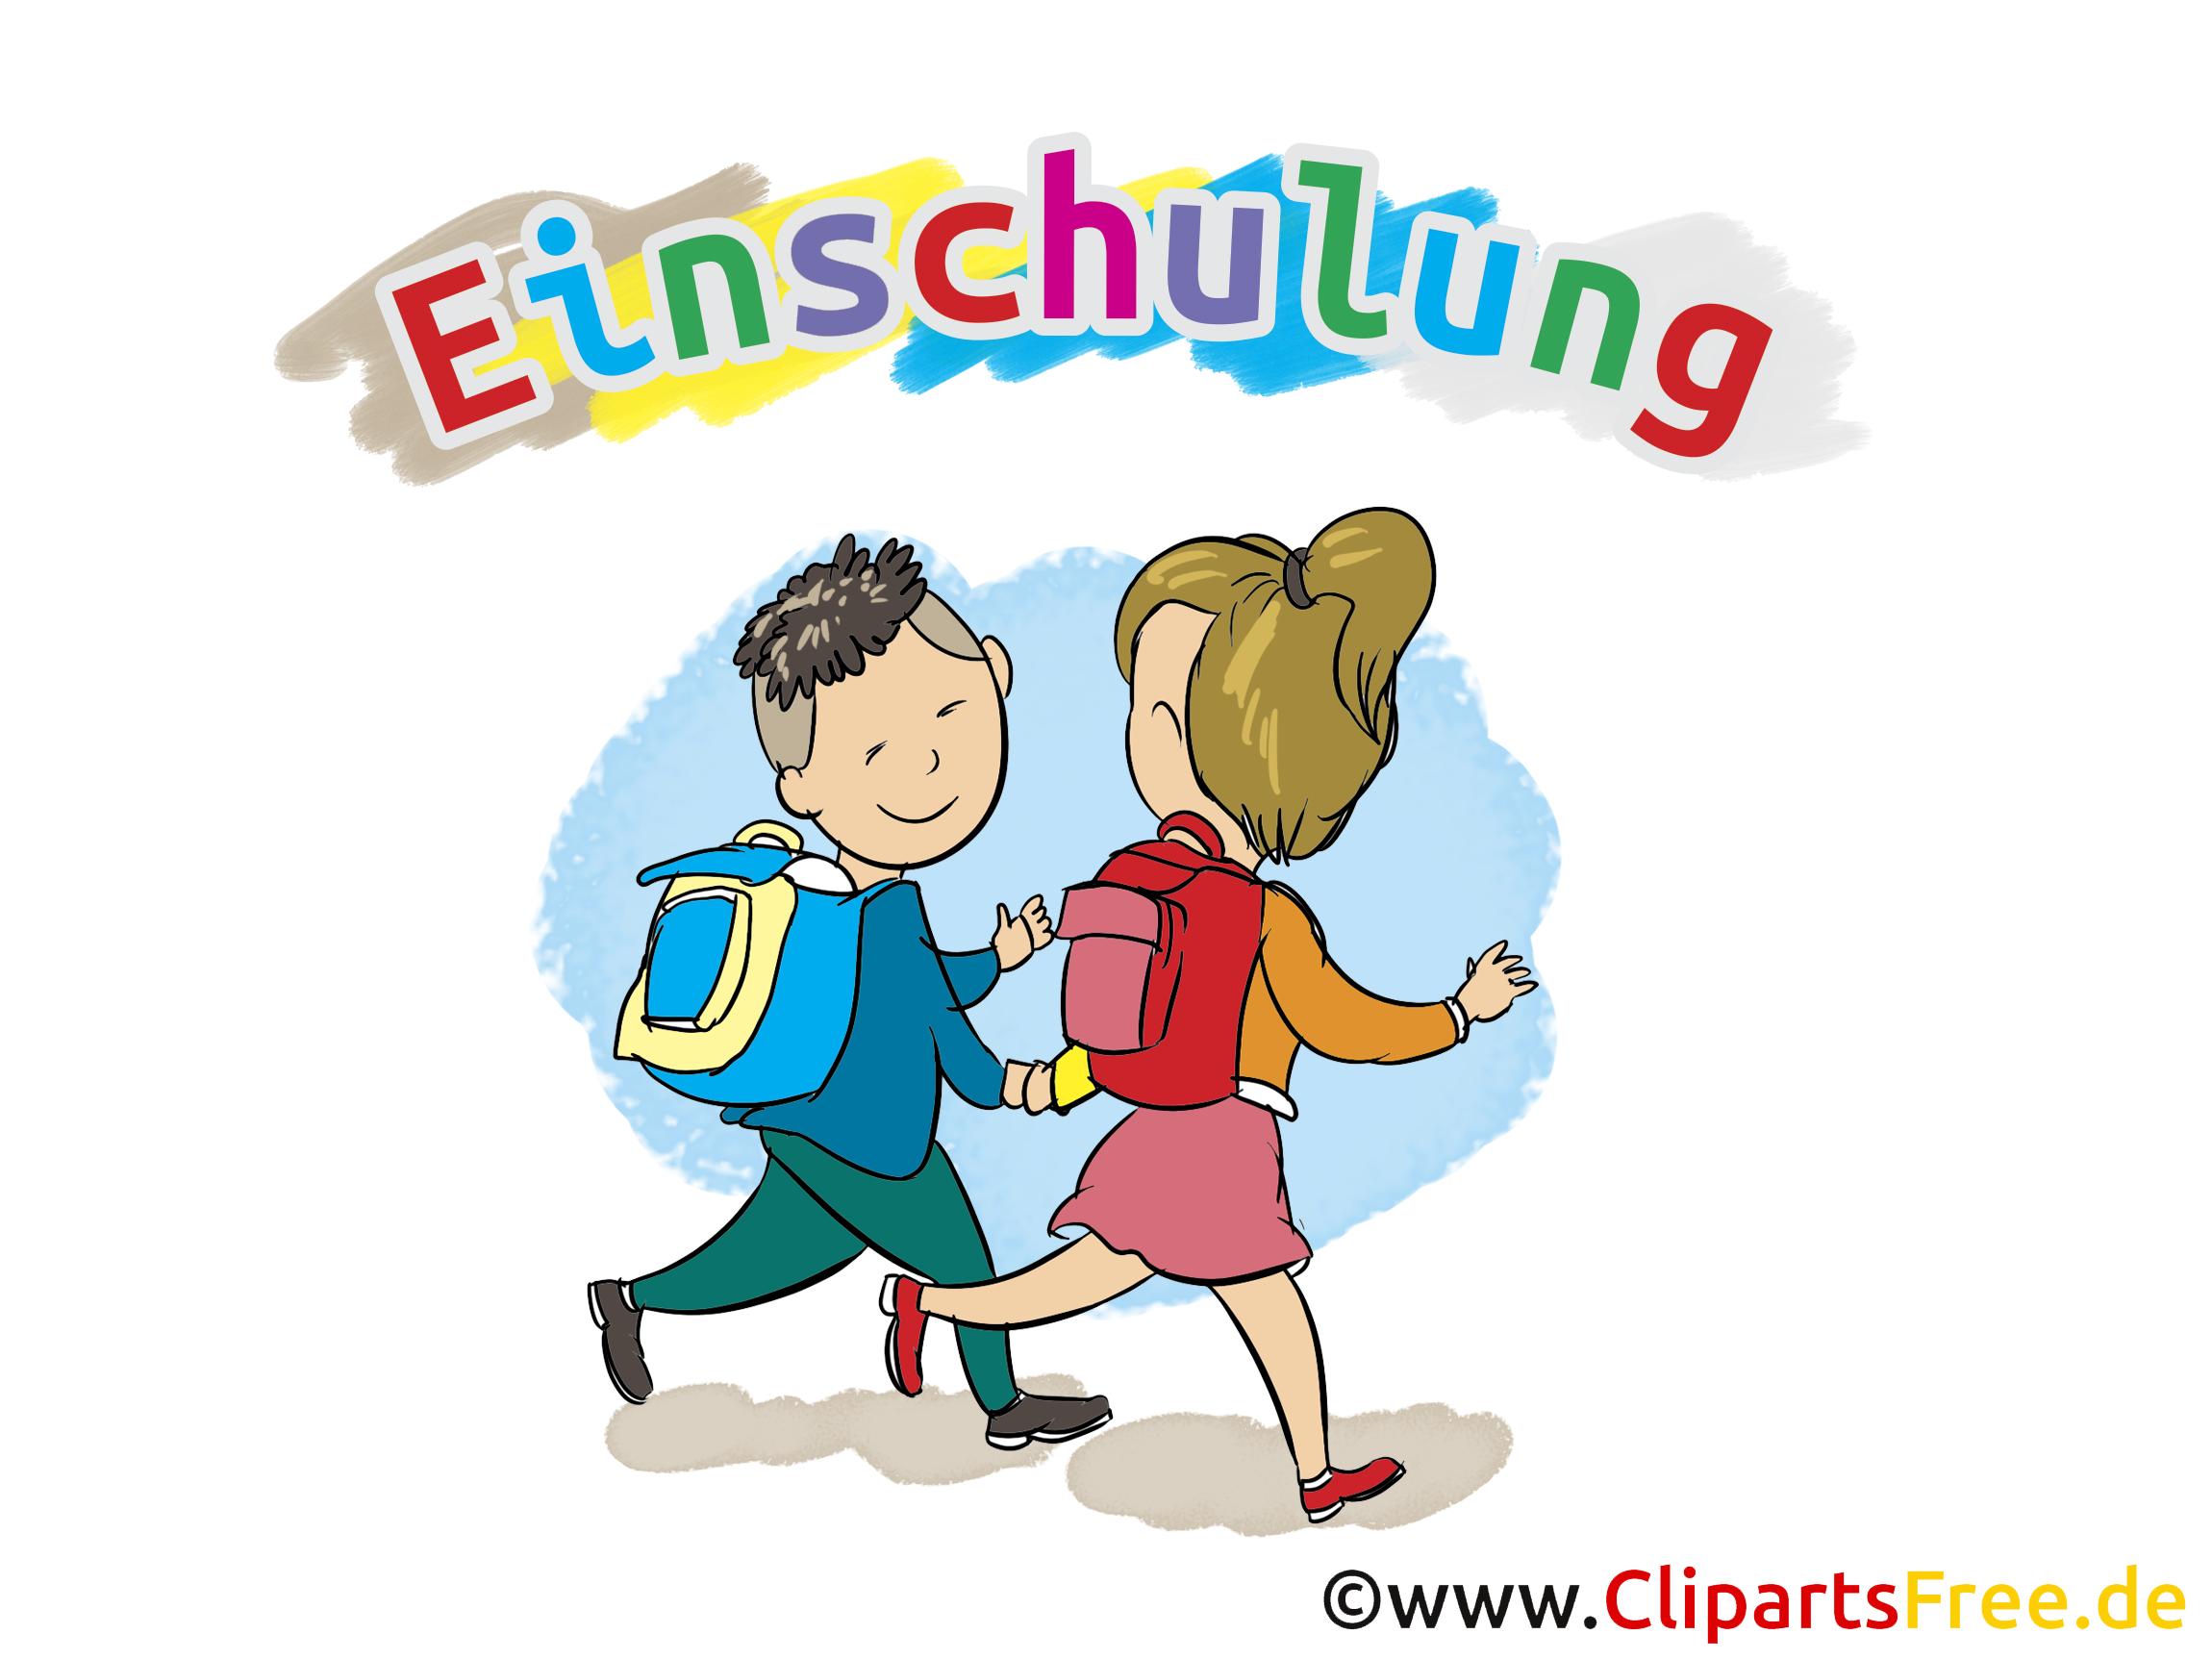 Kinder in der schule clipart clip library stock Einschulung Bilder, Cliparts, Cartoons, Grafiken, Illustrationen ... clip library stock